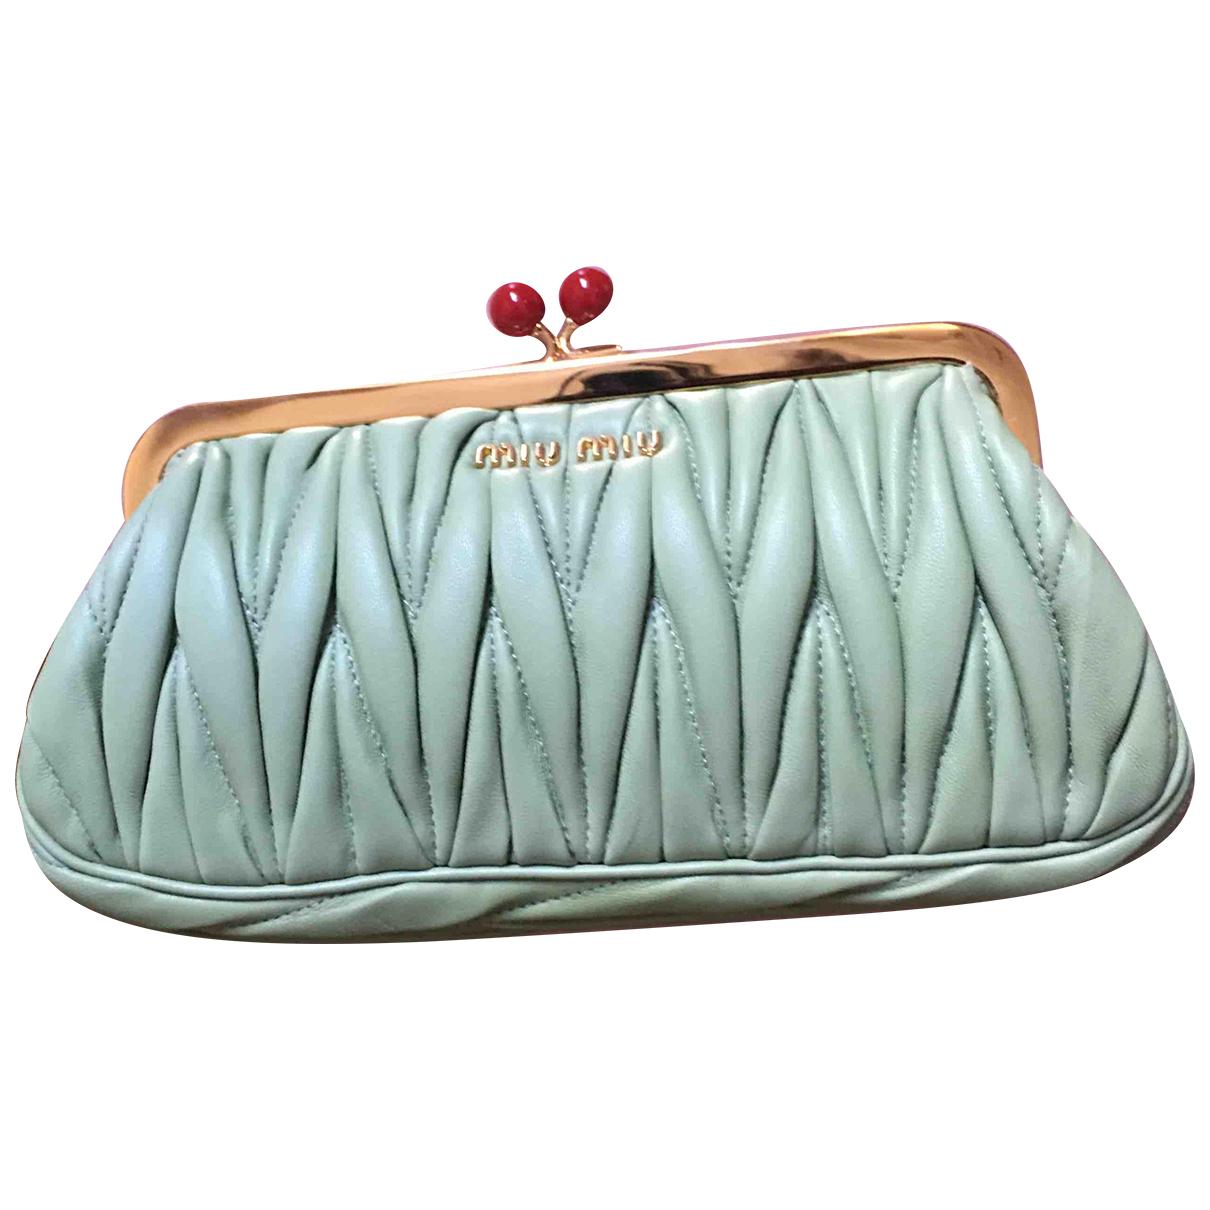 Miu Miu - Petite maroquinerie   pour femme en cuir - vert